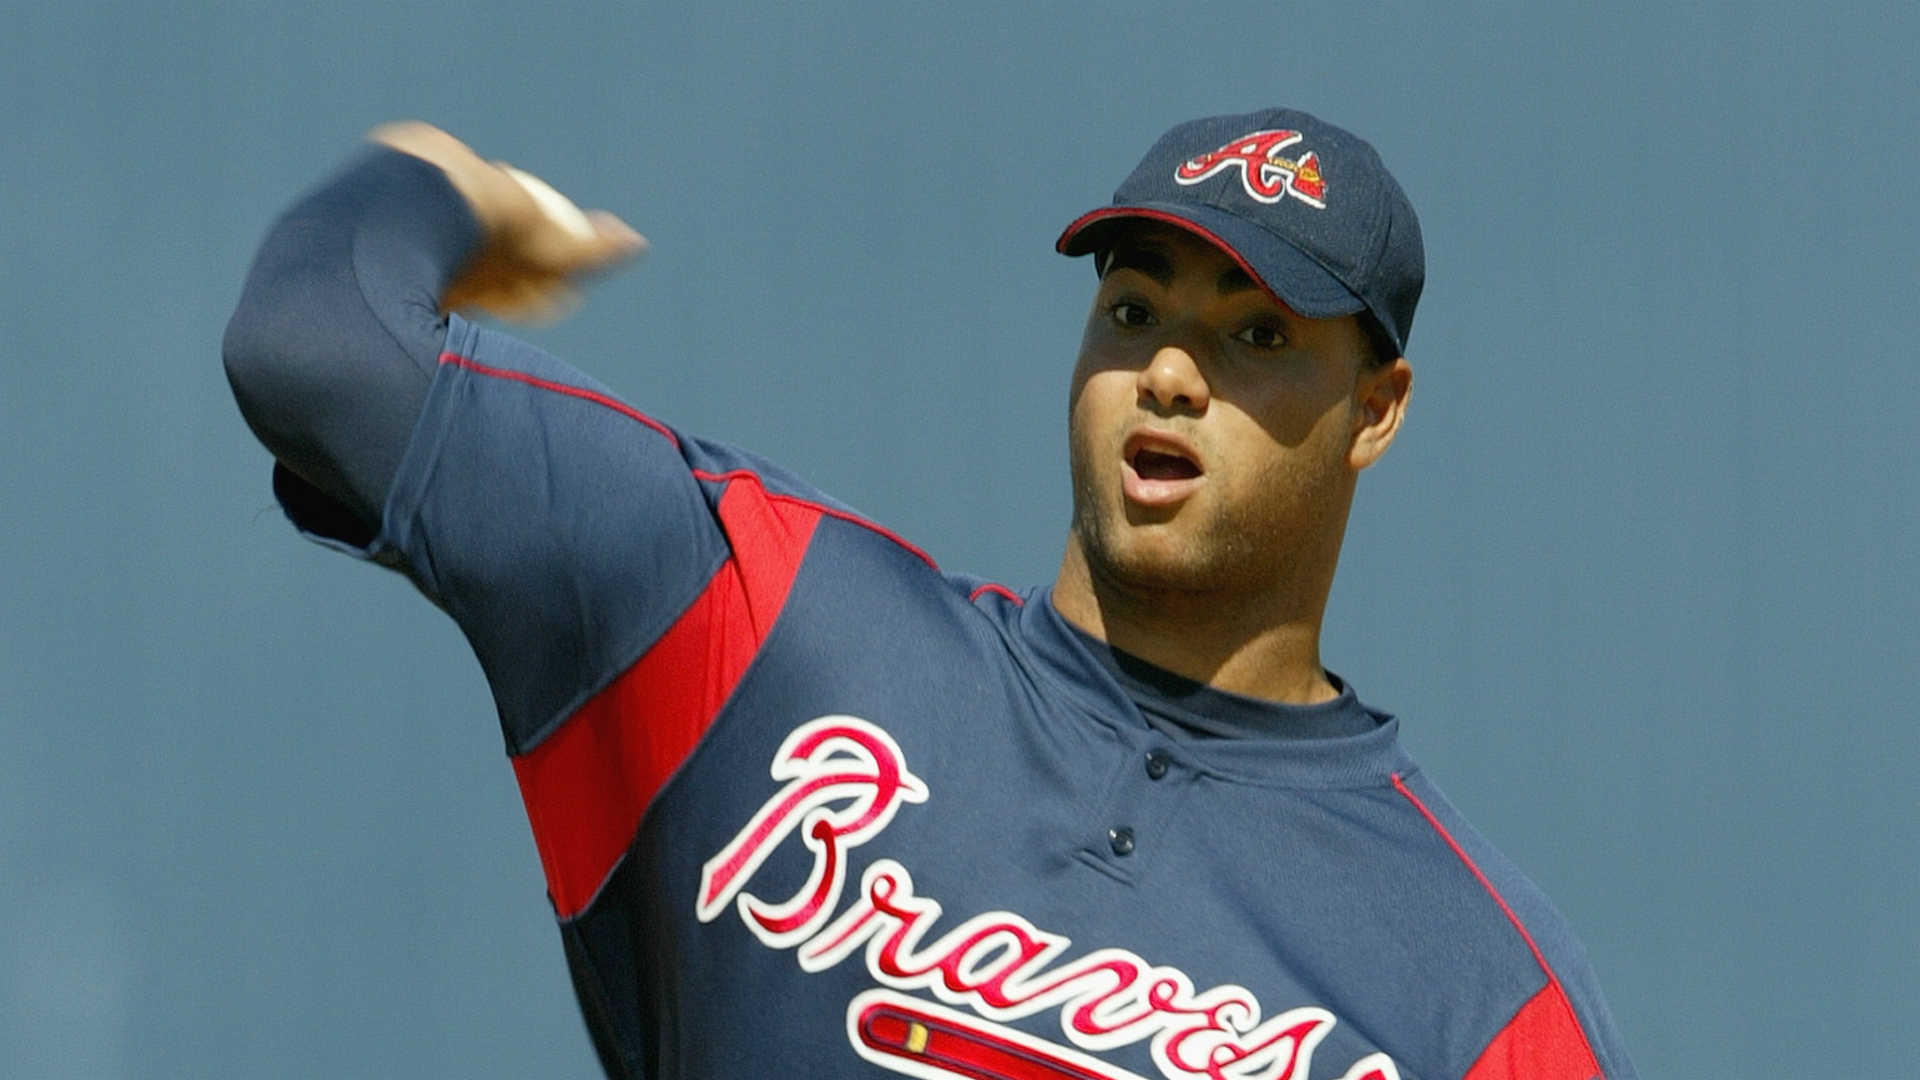 Former Braves pitcher Jose Capellan